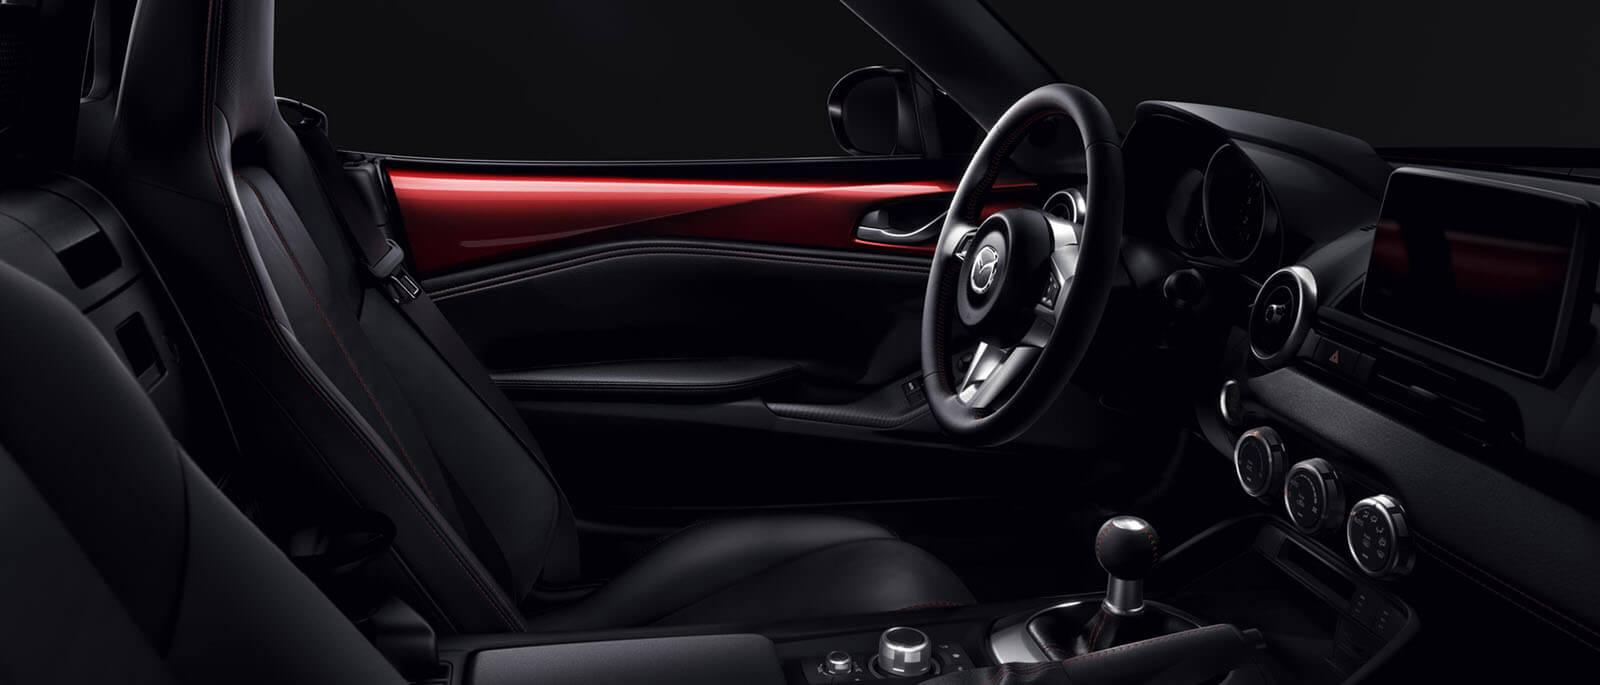 2017 Mazda MX-5 RF interior dashboard view